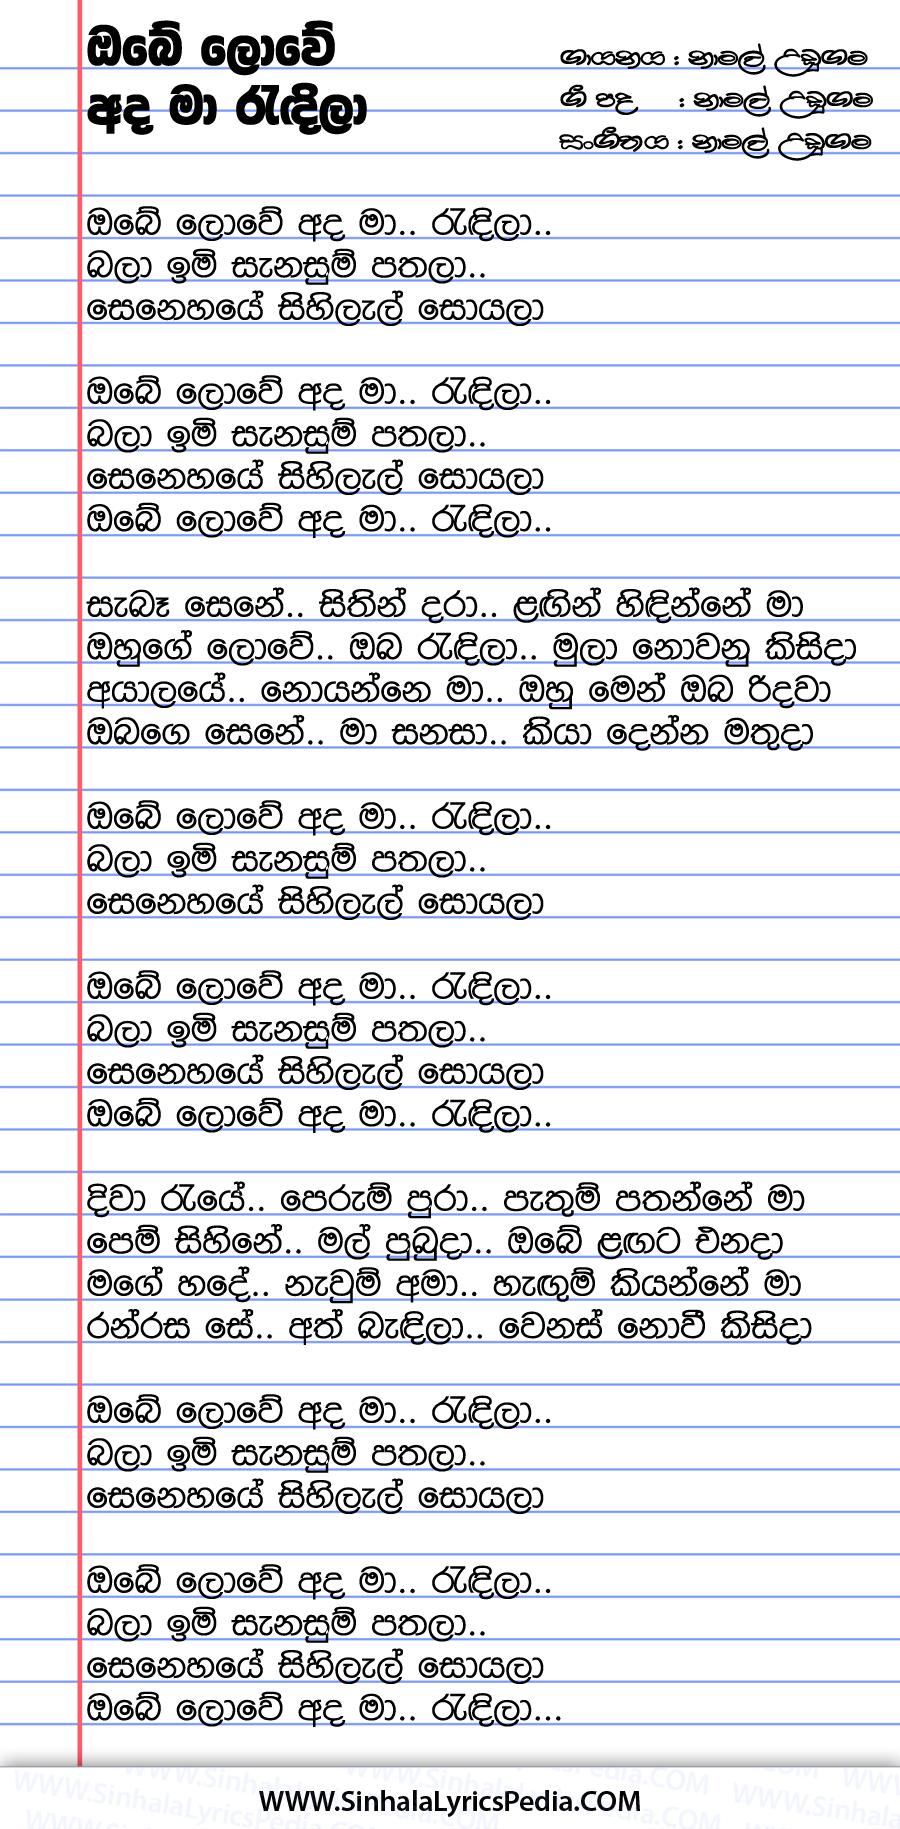 Obe Lowe Ada Ma Radila Song Lyrics